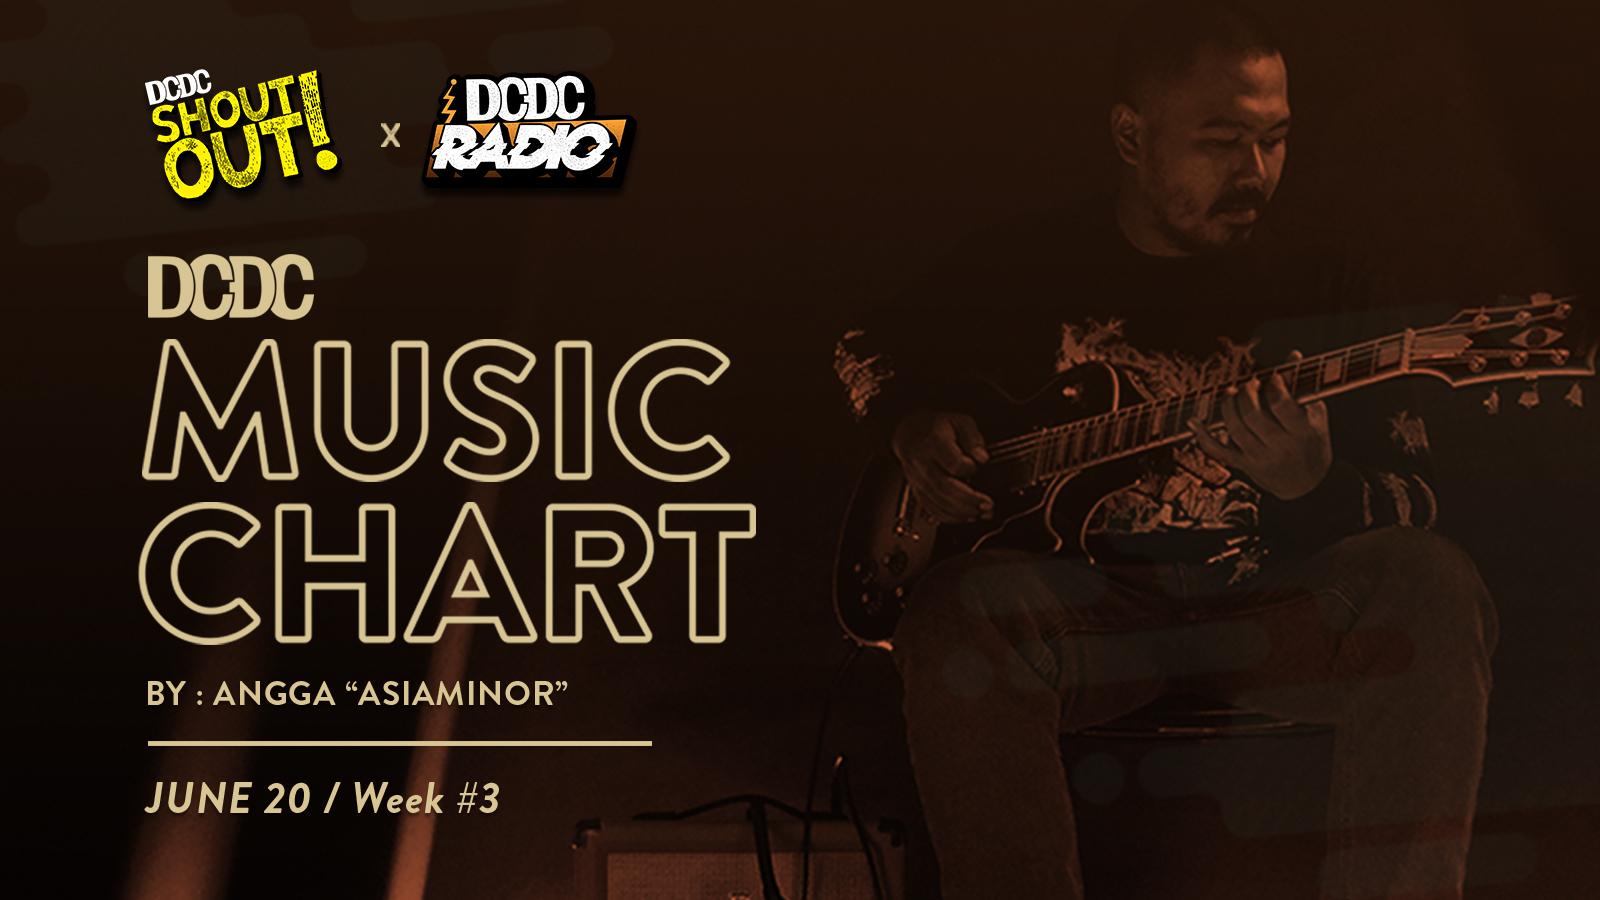 DCDC Music Chart - #3rd Week of June 2020